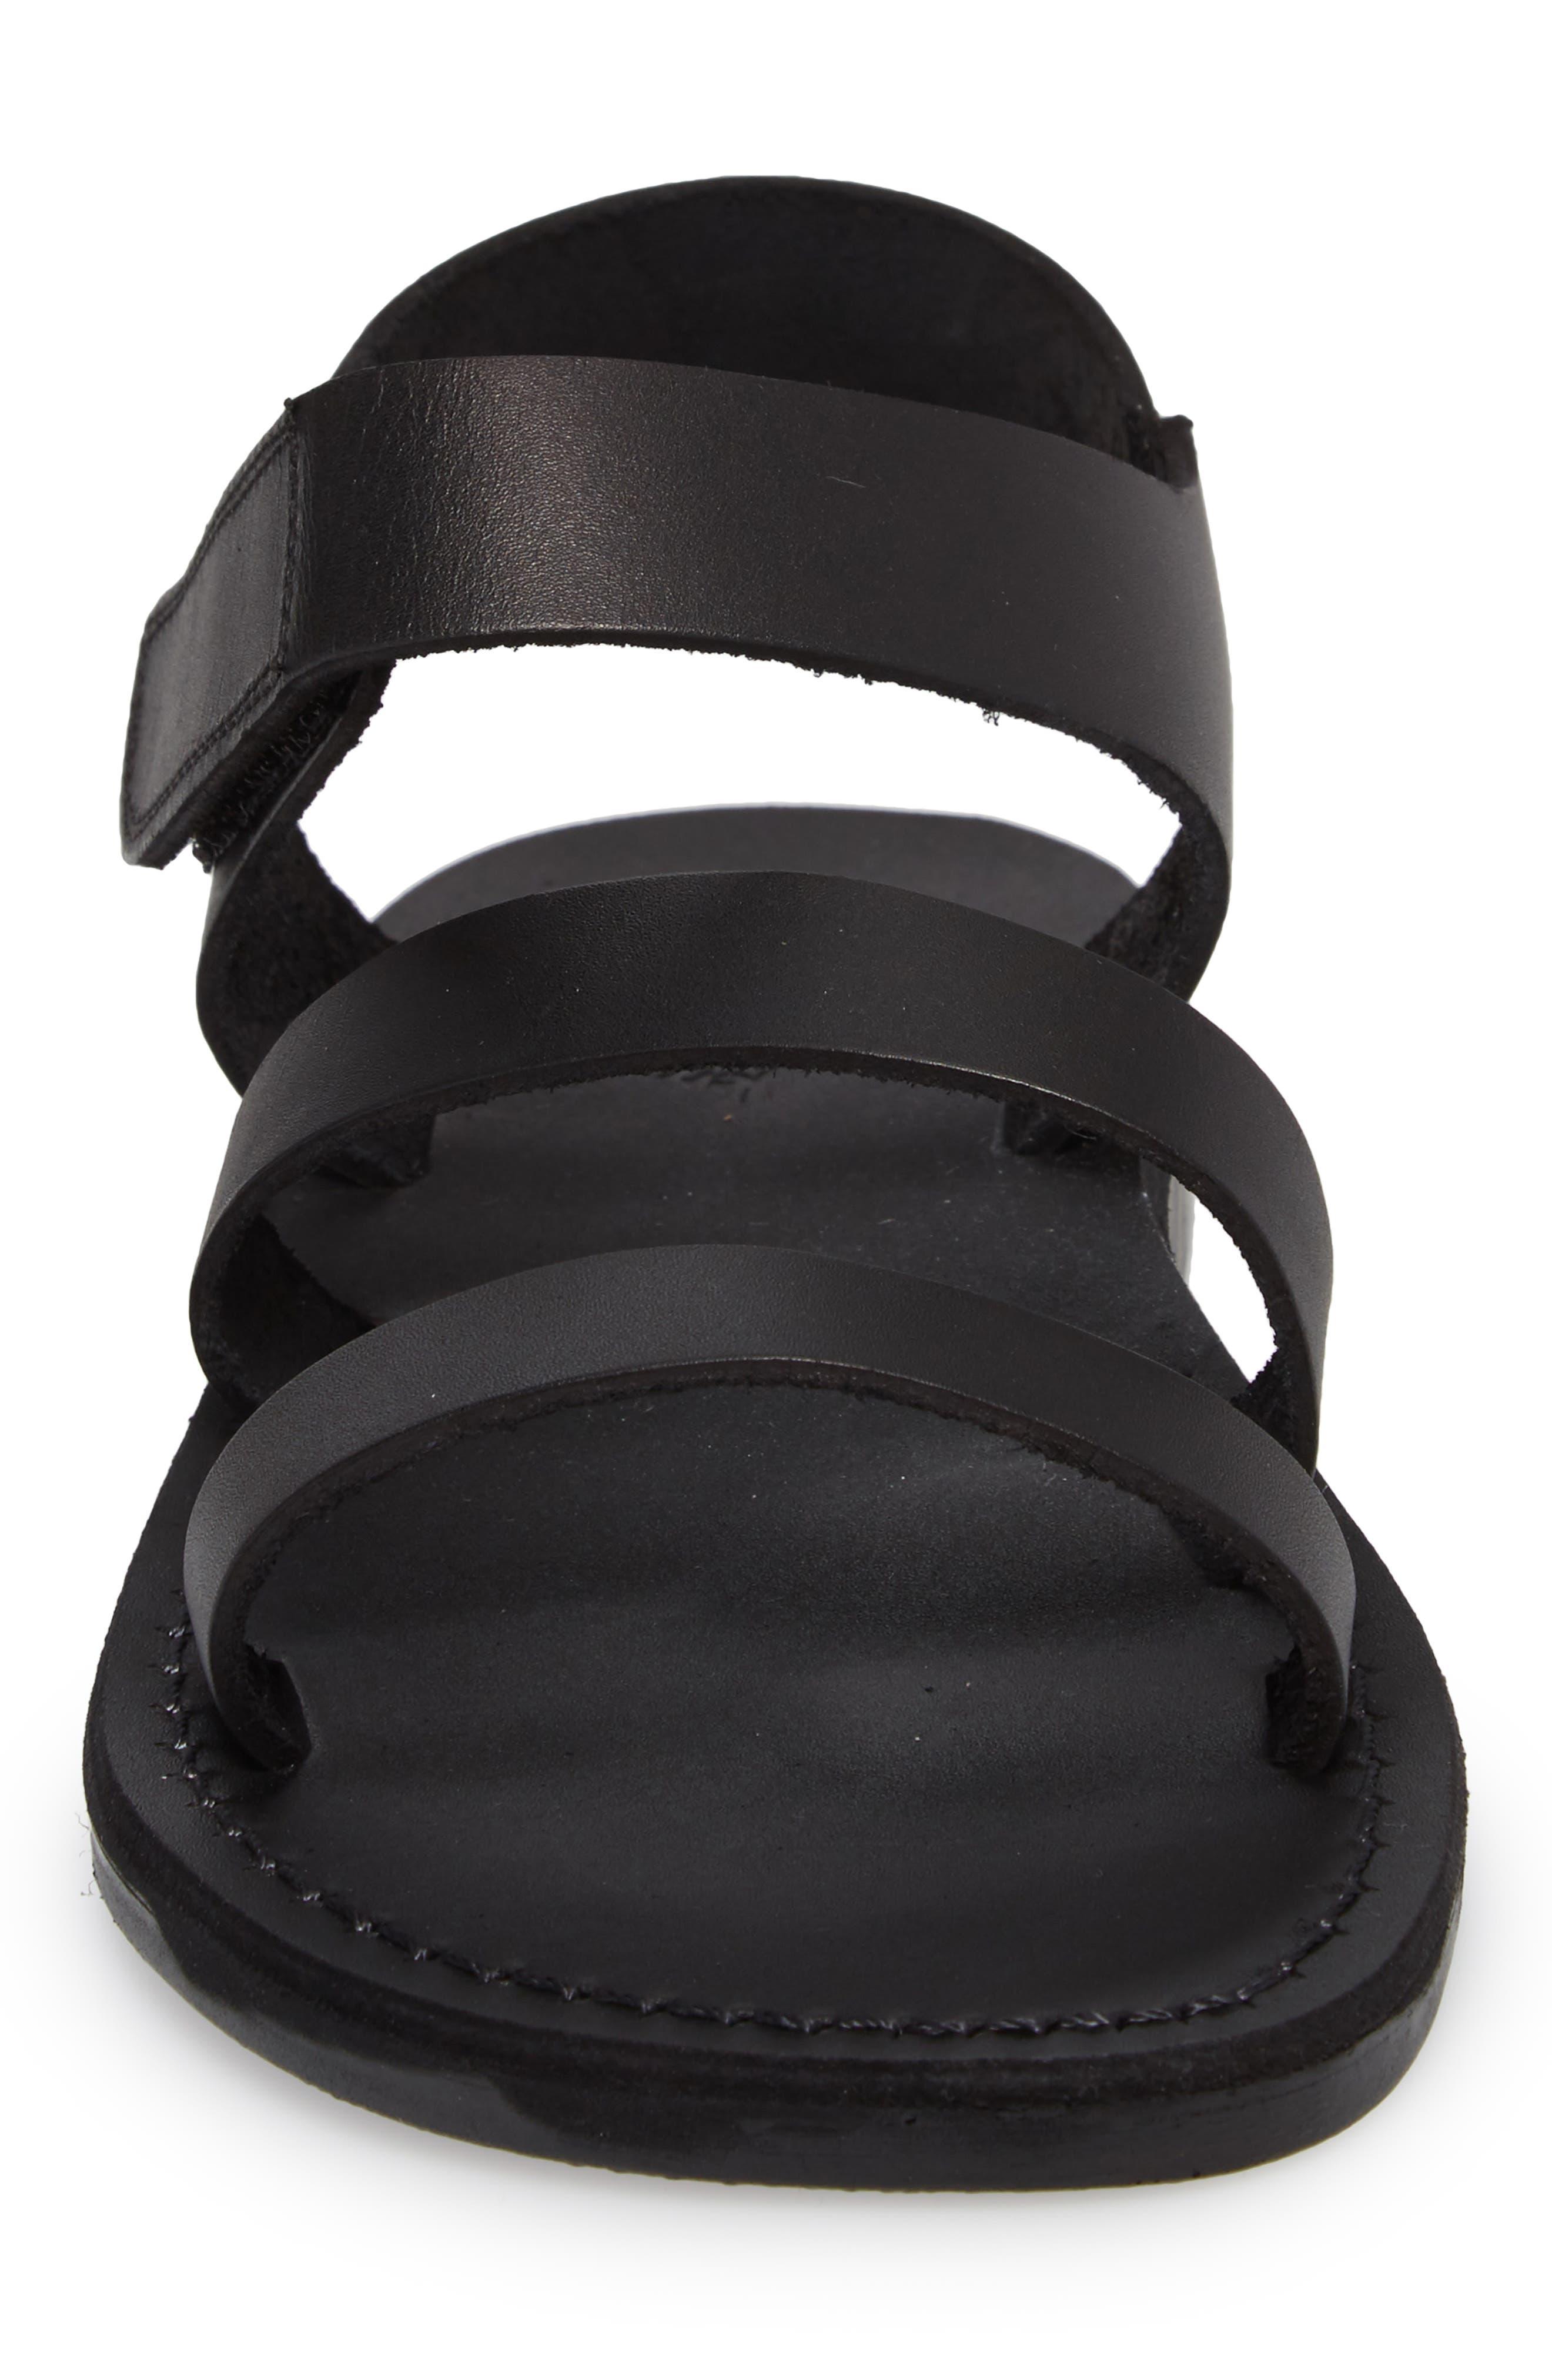 Jared Sandal,                             Alternate thumbnail 4, color,                             Black Leather